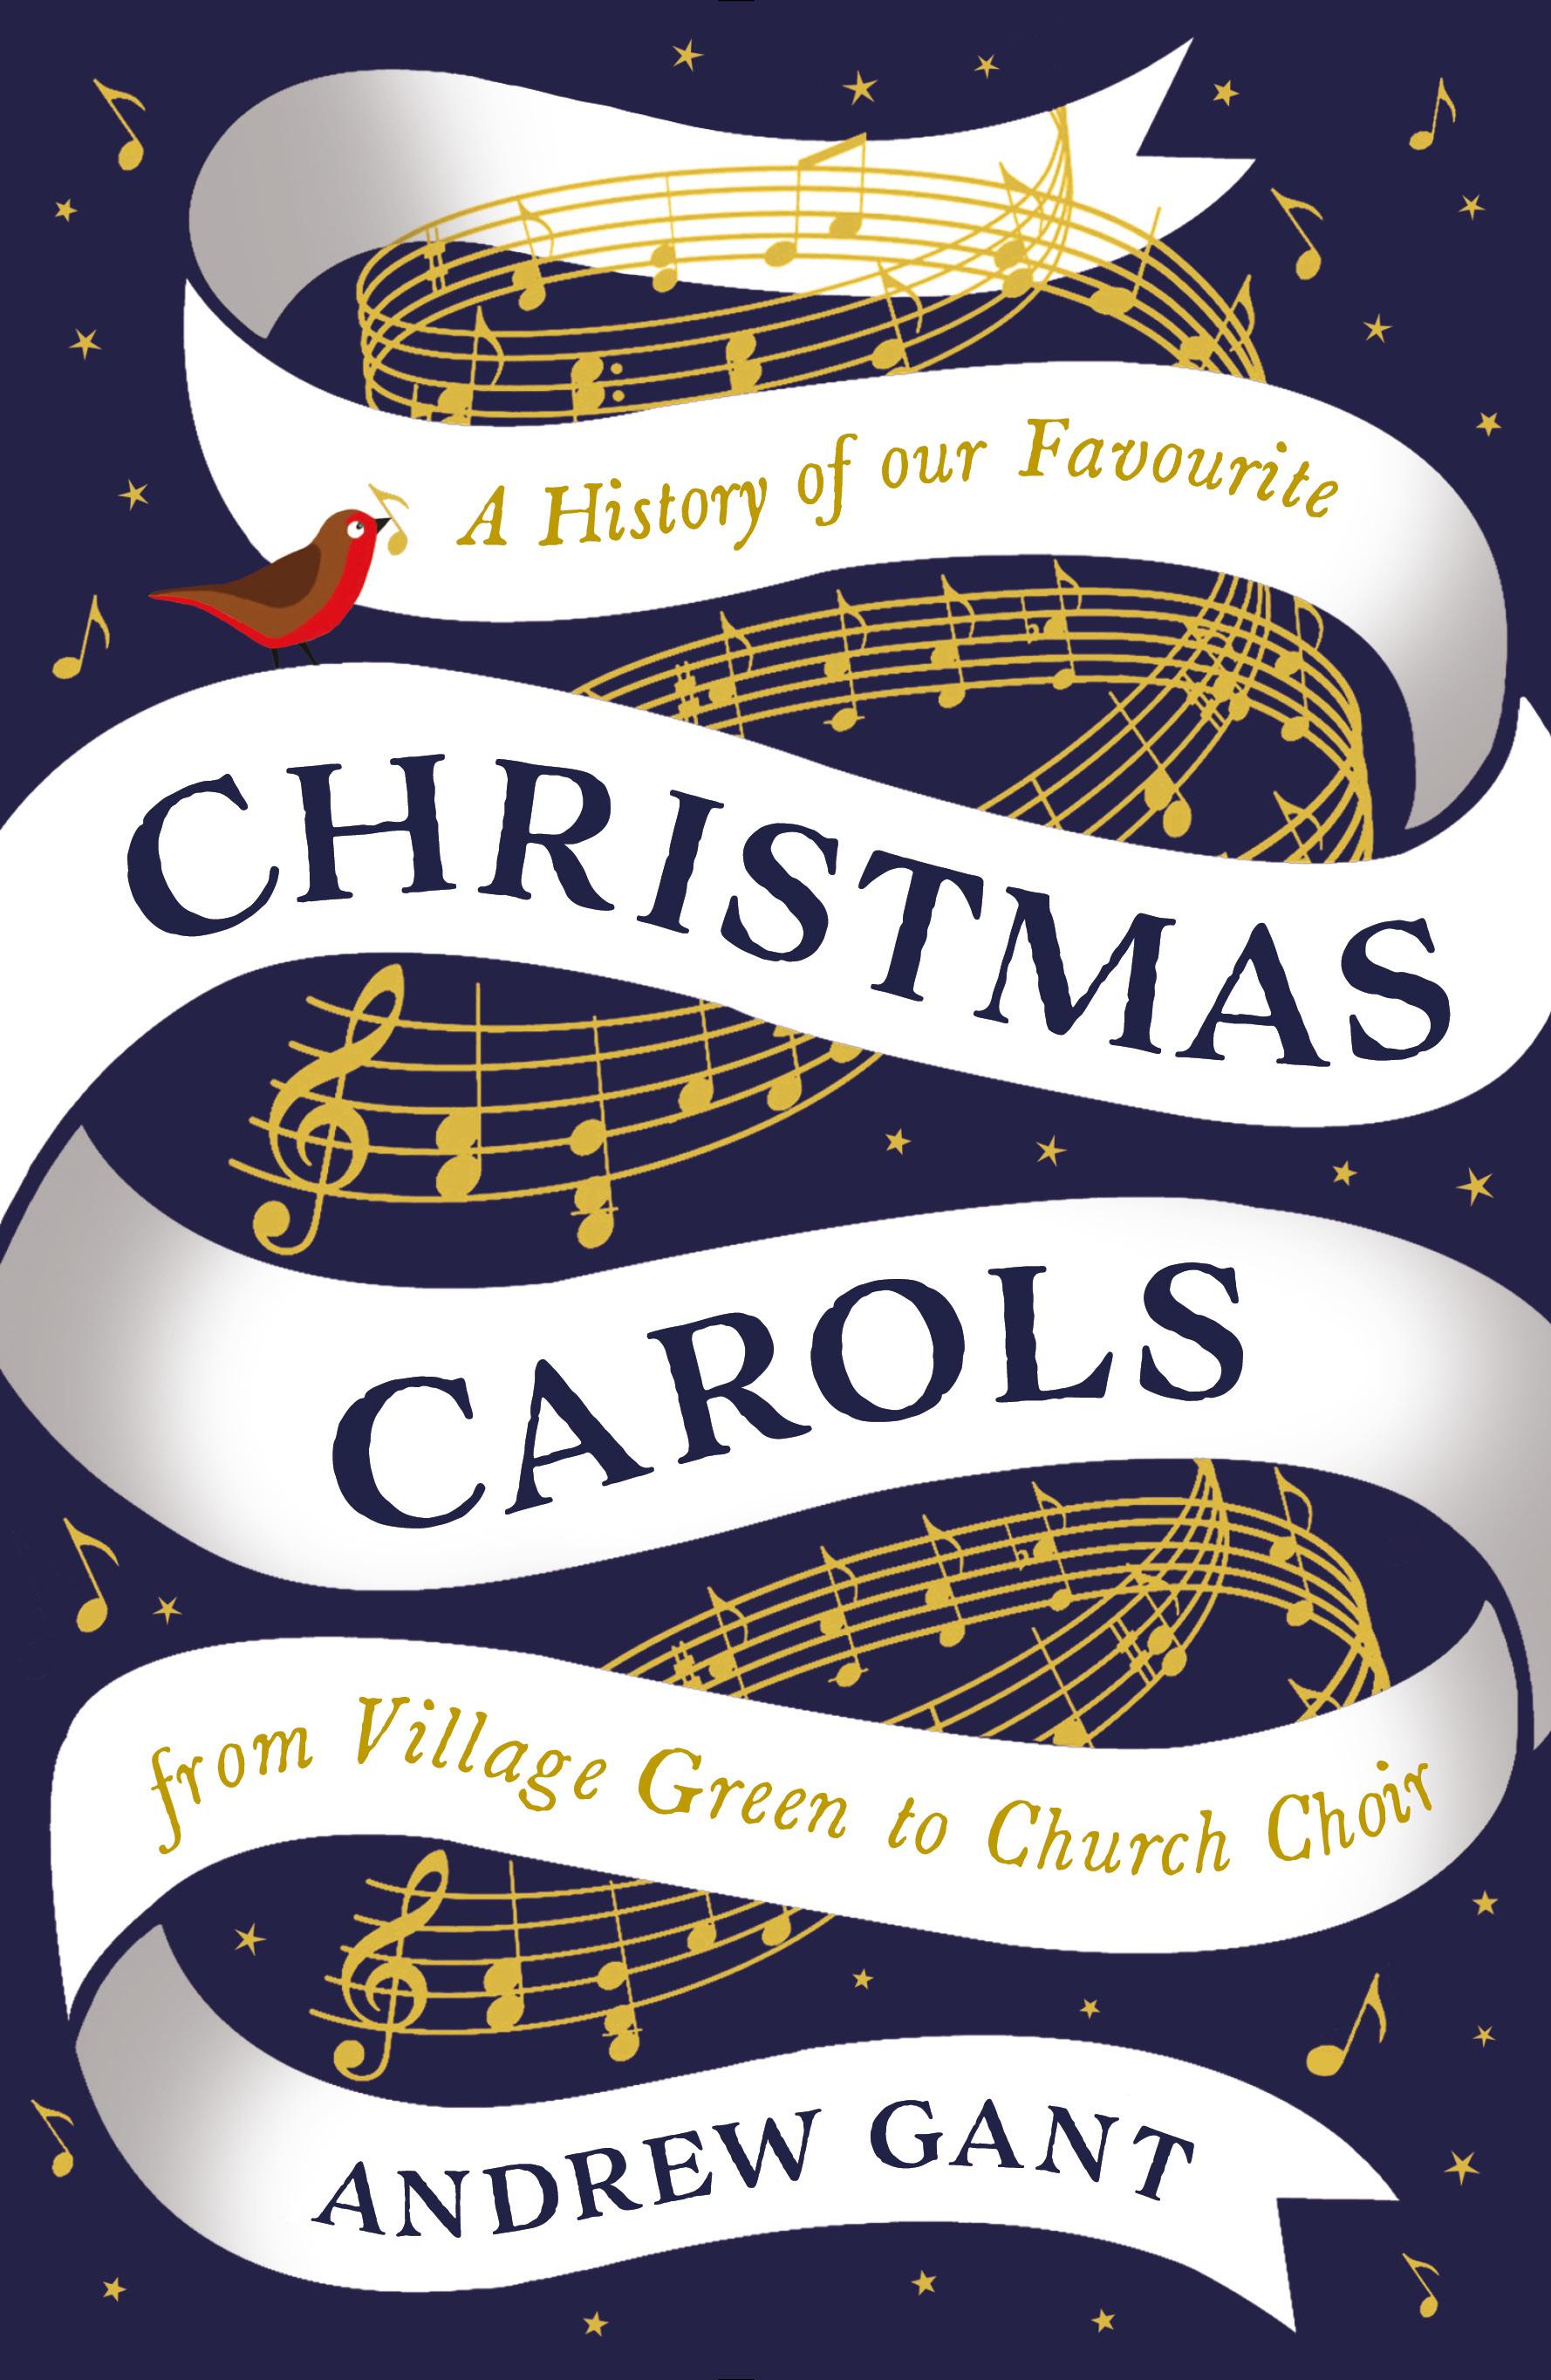 Christmas Carols - Andrew Gant - 9781781253533 - Allen & Unwin - Australia